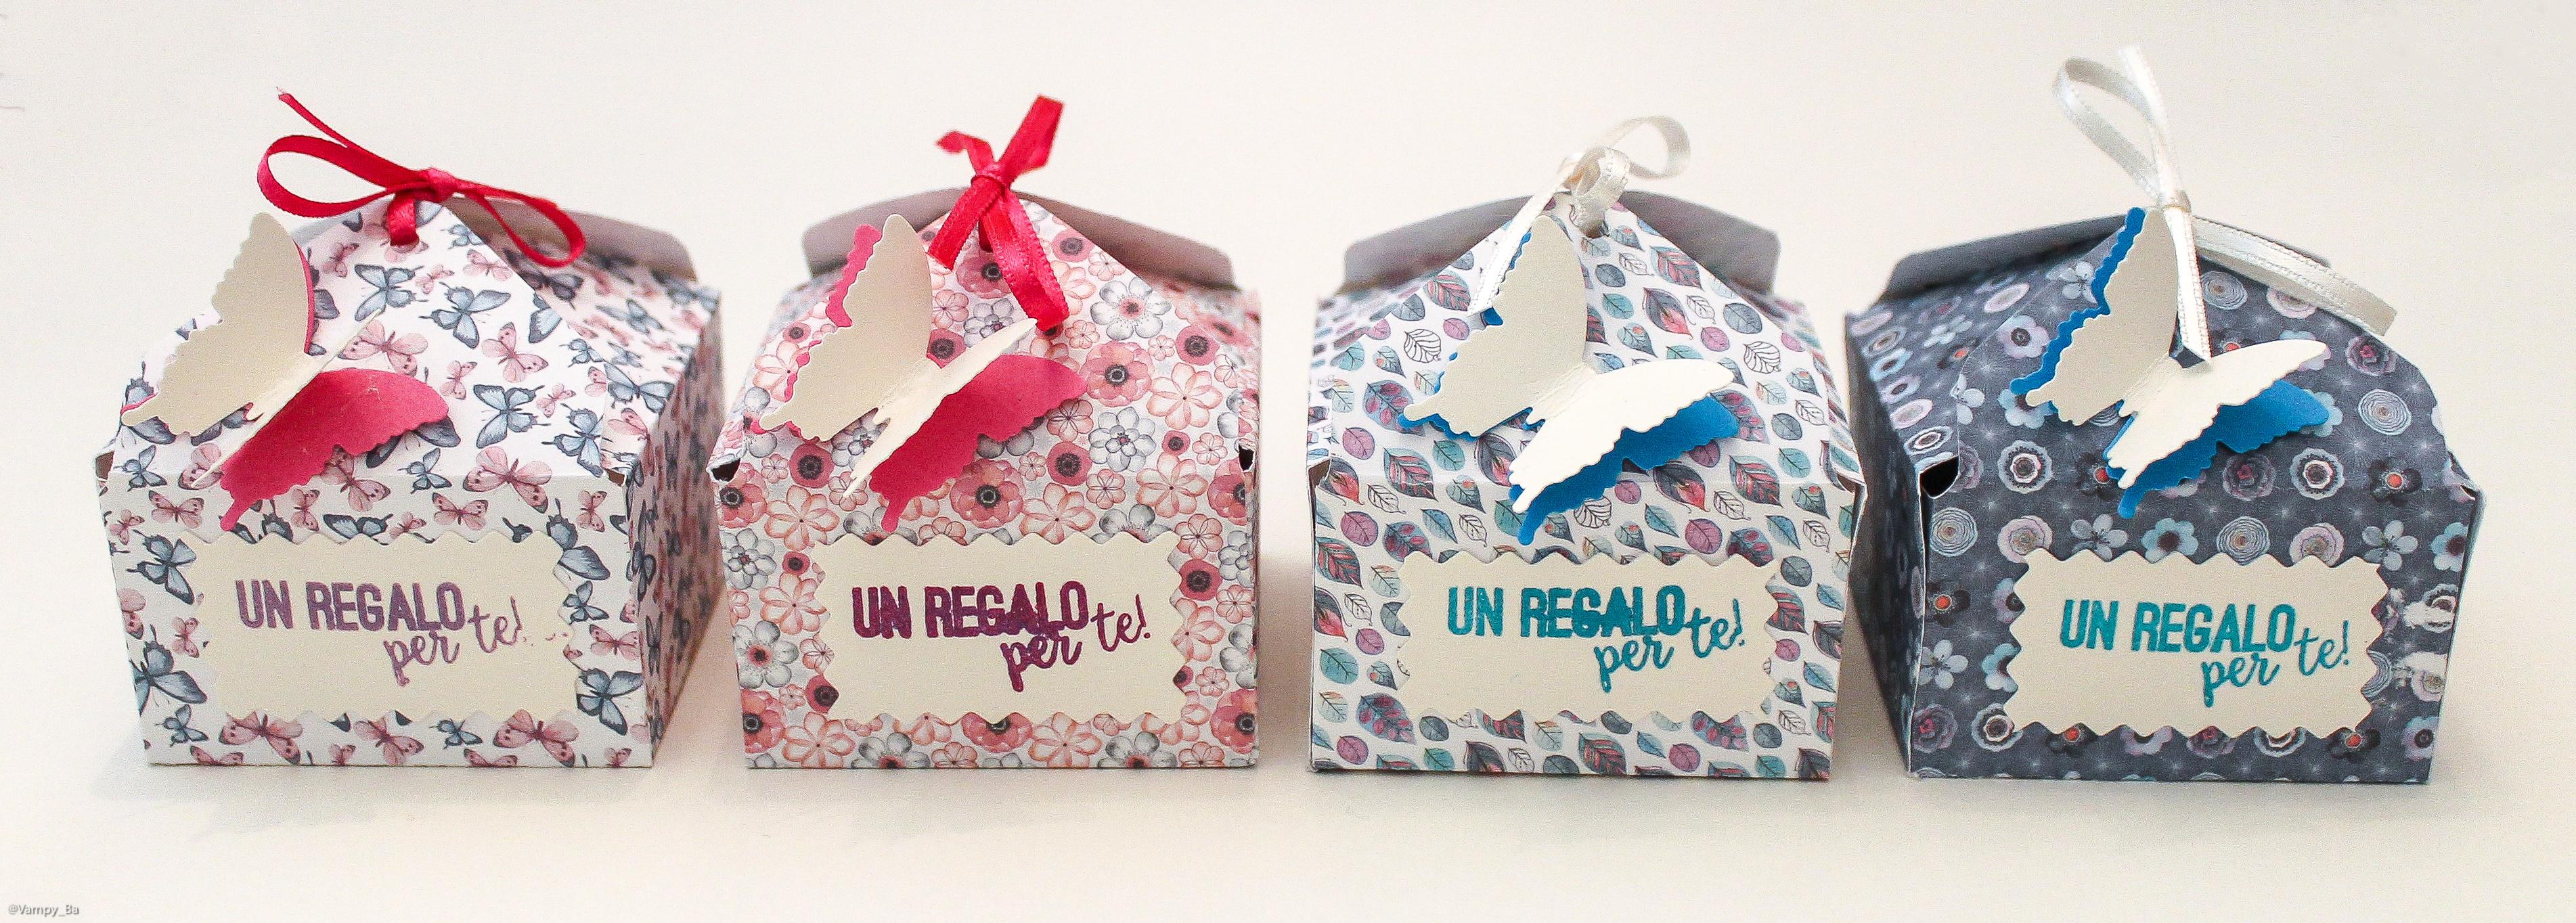 giftfarfalle_mirabilecarta12.jpg